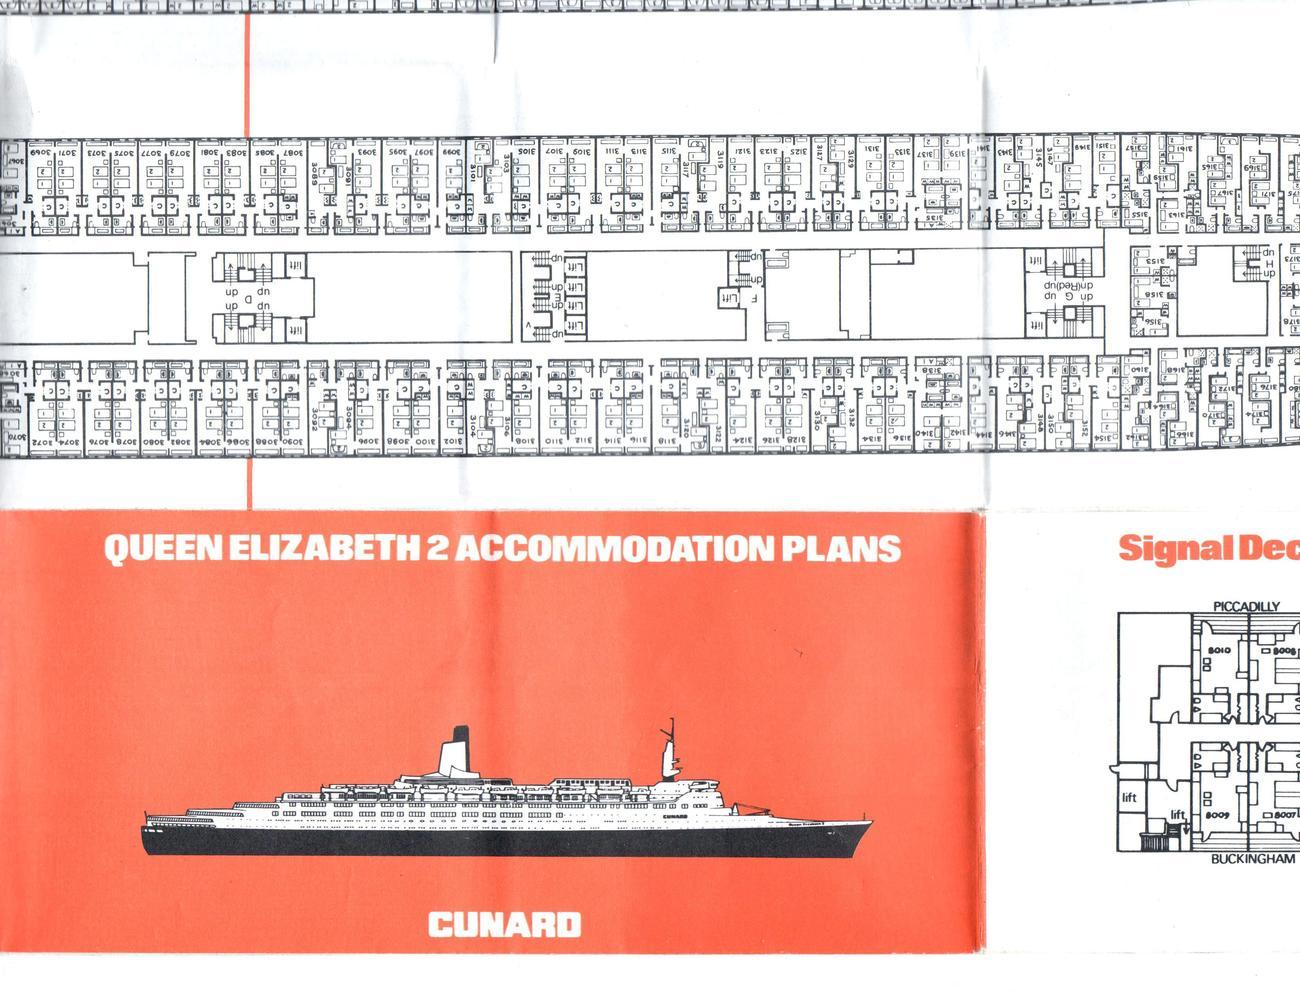 H.M.S. Queen Elizabeth 2 - Deck Plan - Accommodation Plan of Cunard Line QE2